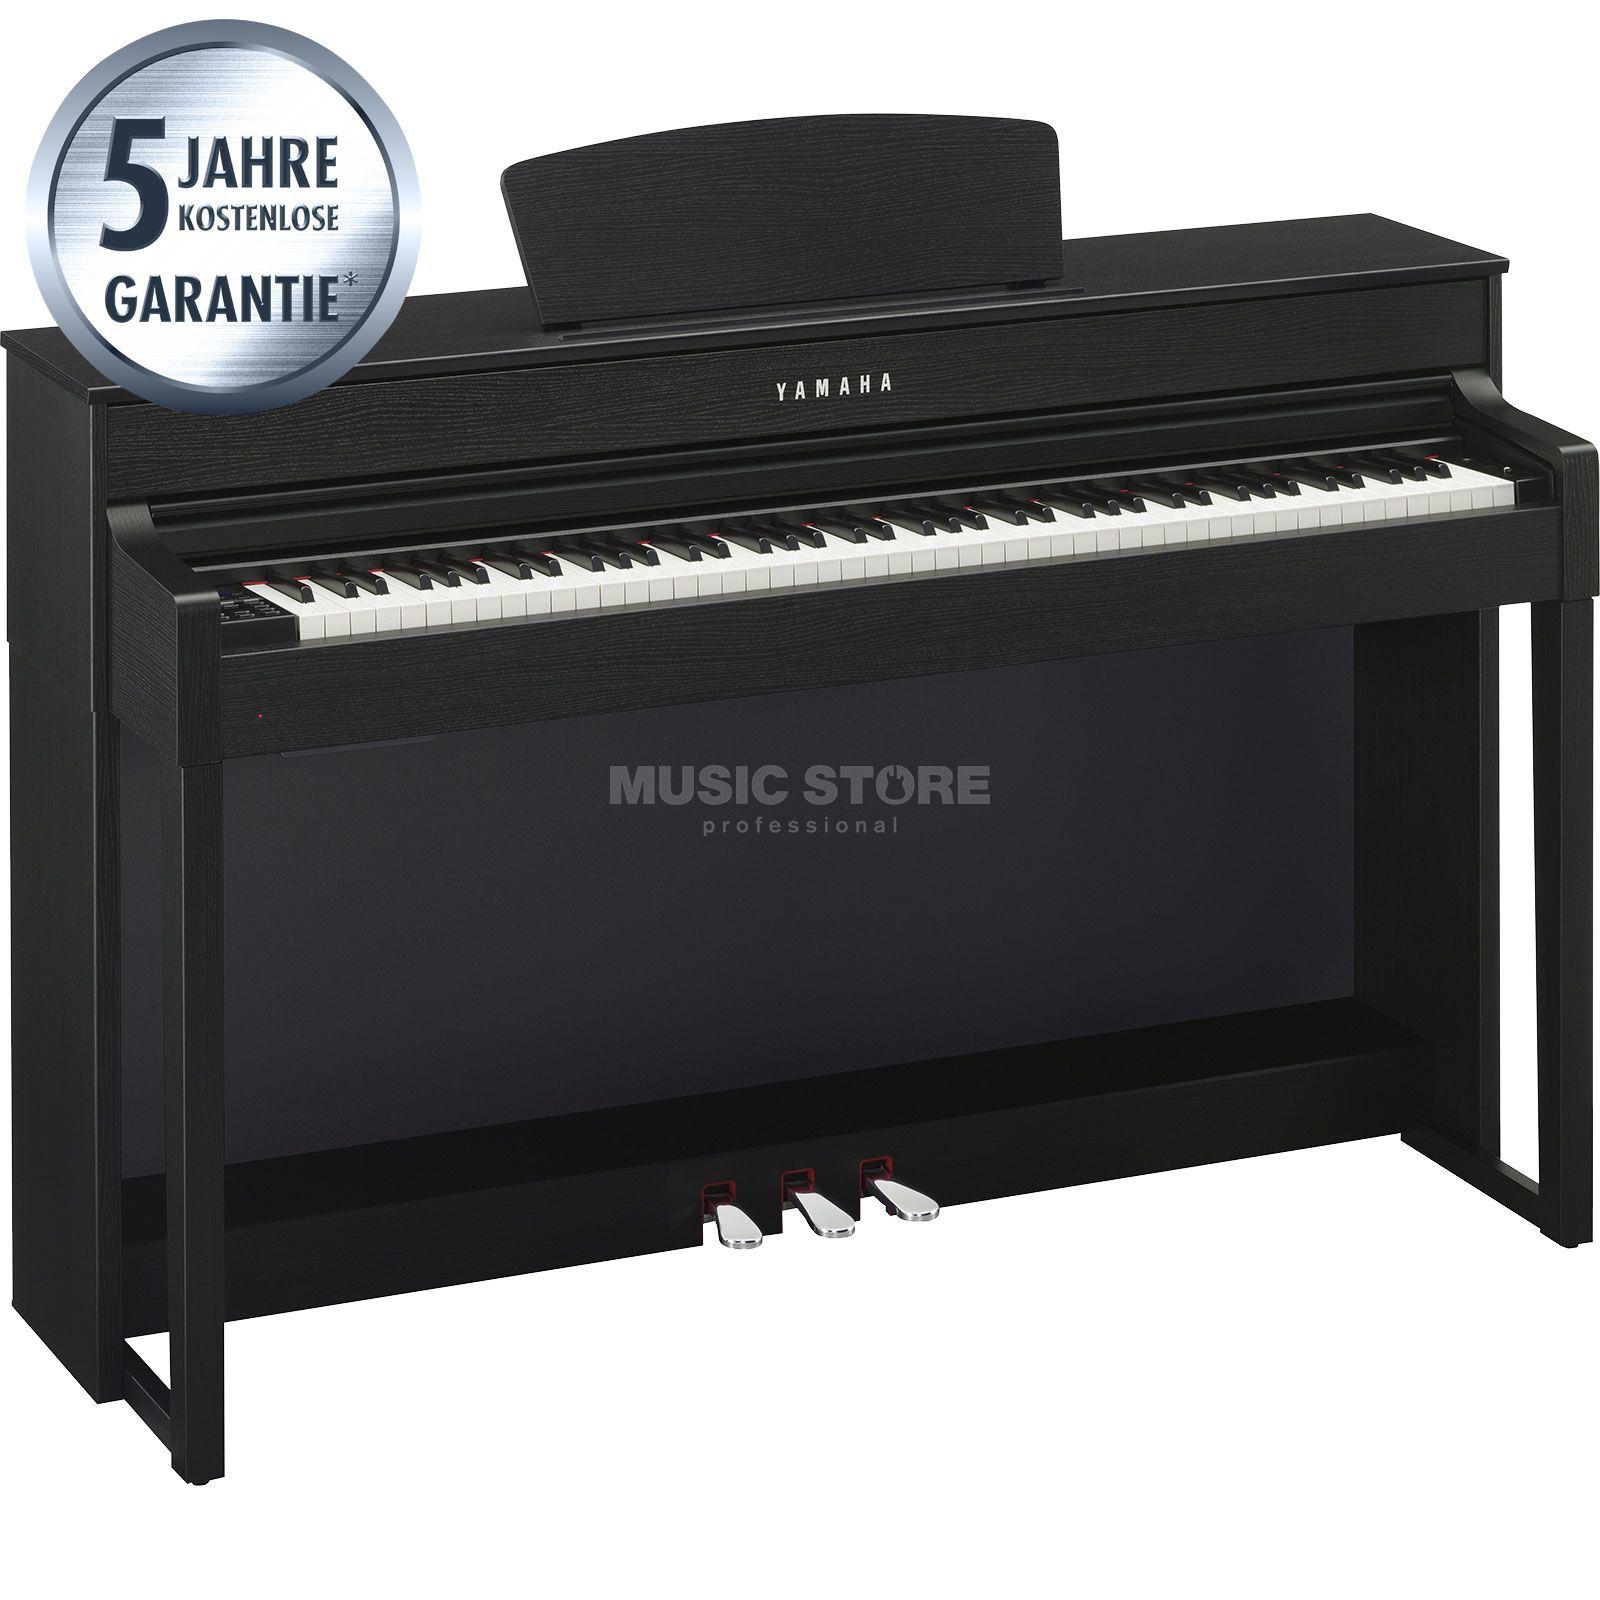 Yamaha clavinova clp 535 b digitaal piano zwart for Yamaha digital piano clp 535